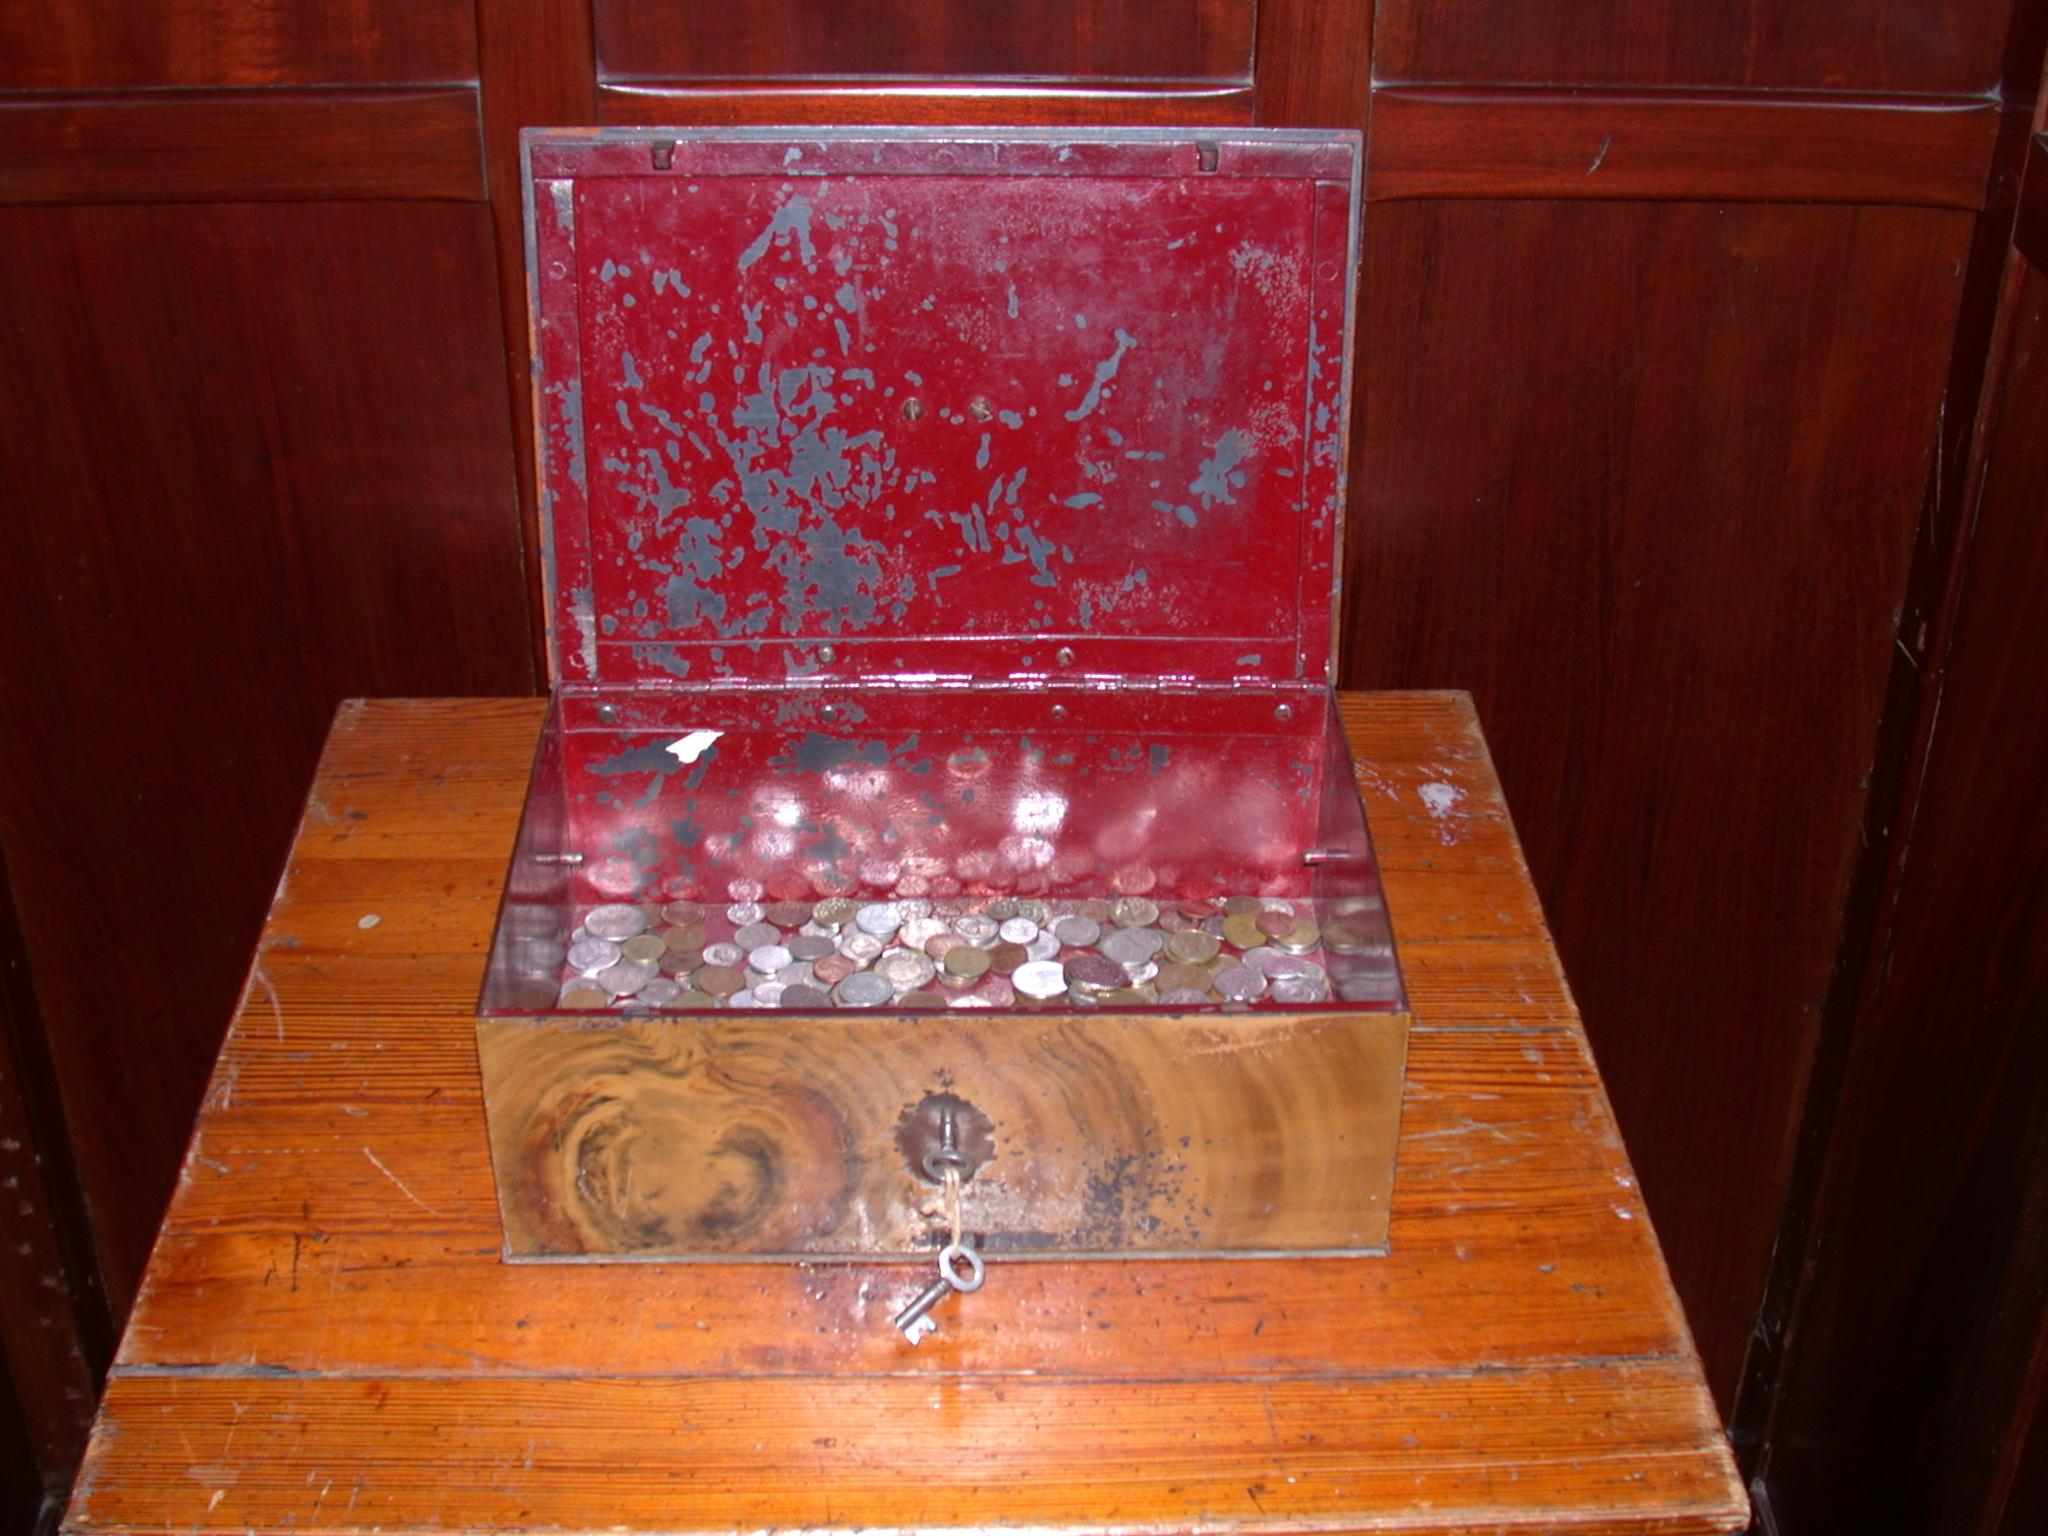 vault money box objects metal lock locker valuables valuable texture painted deposit safetydeposit wood